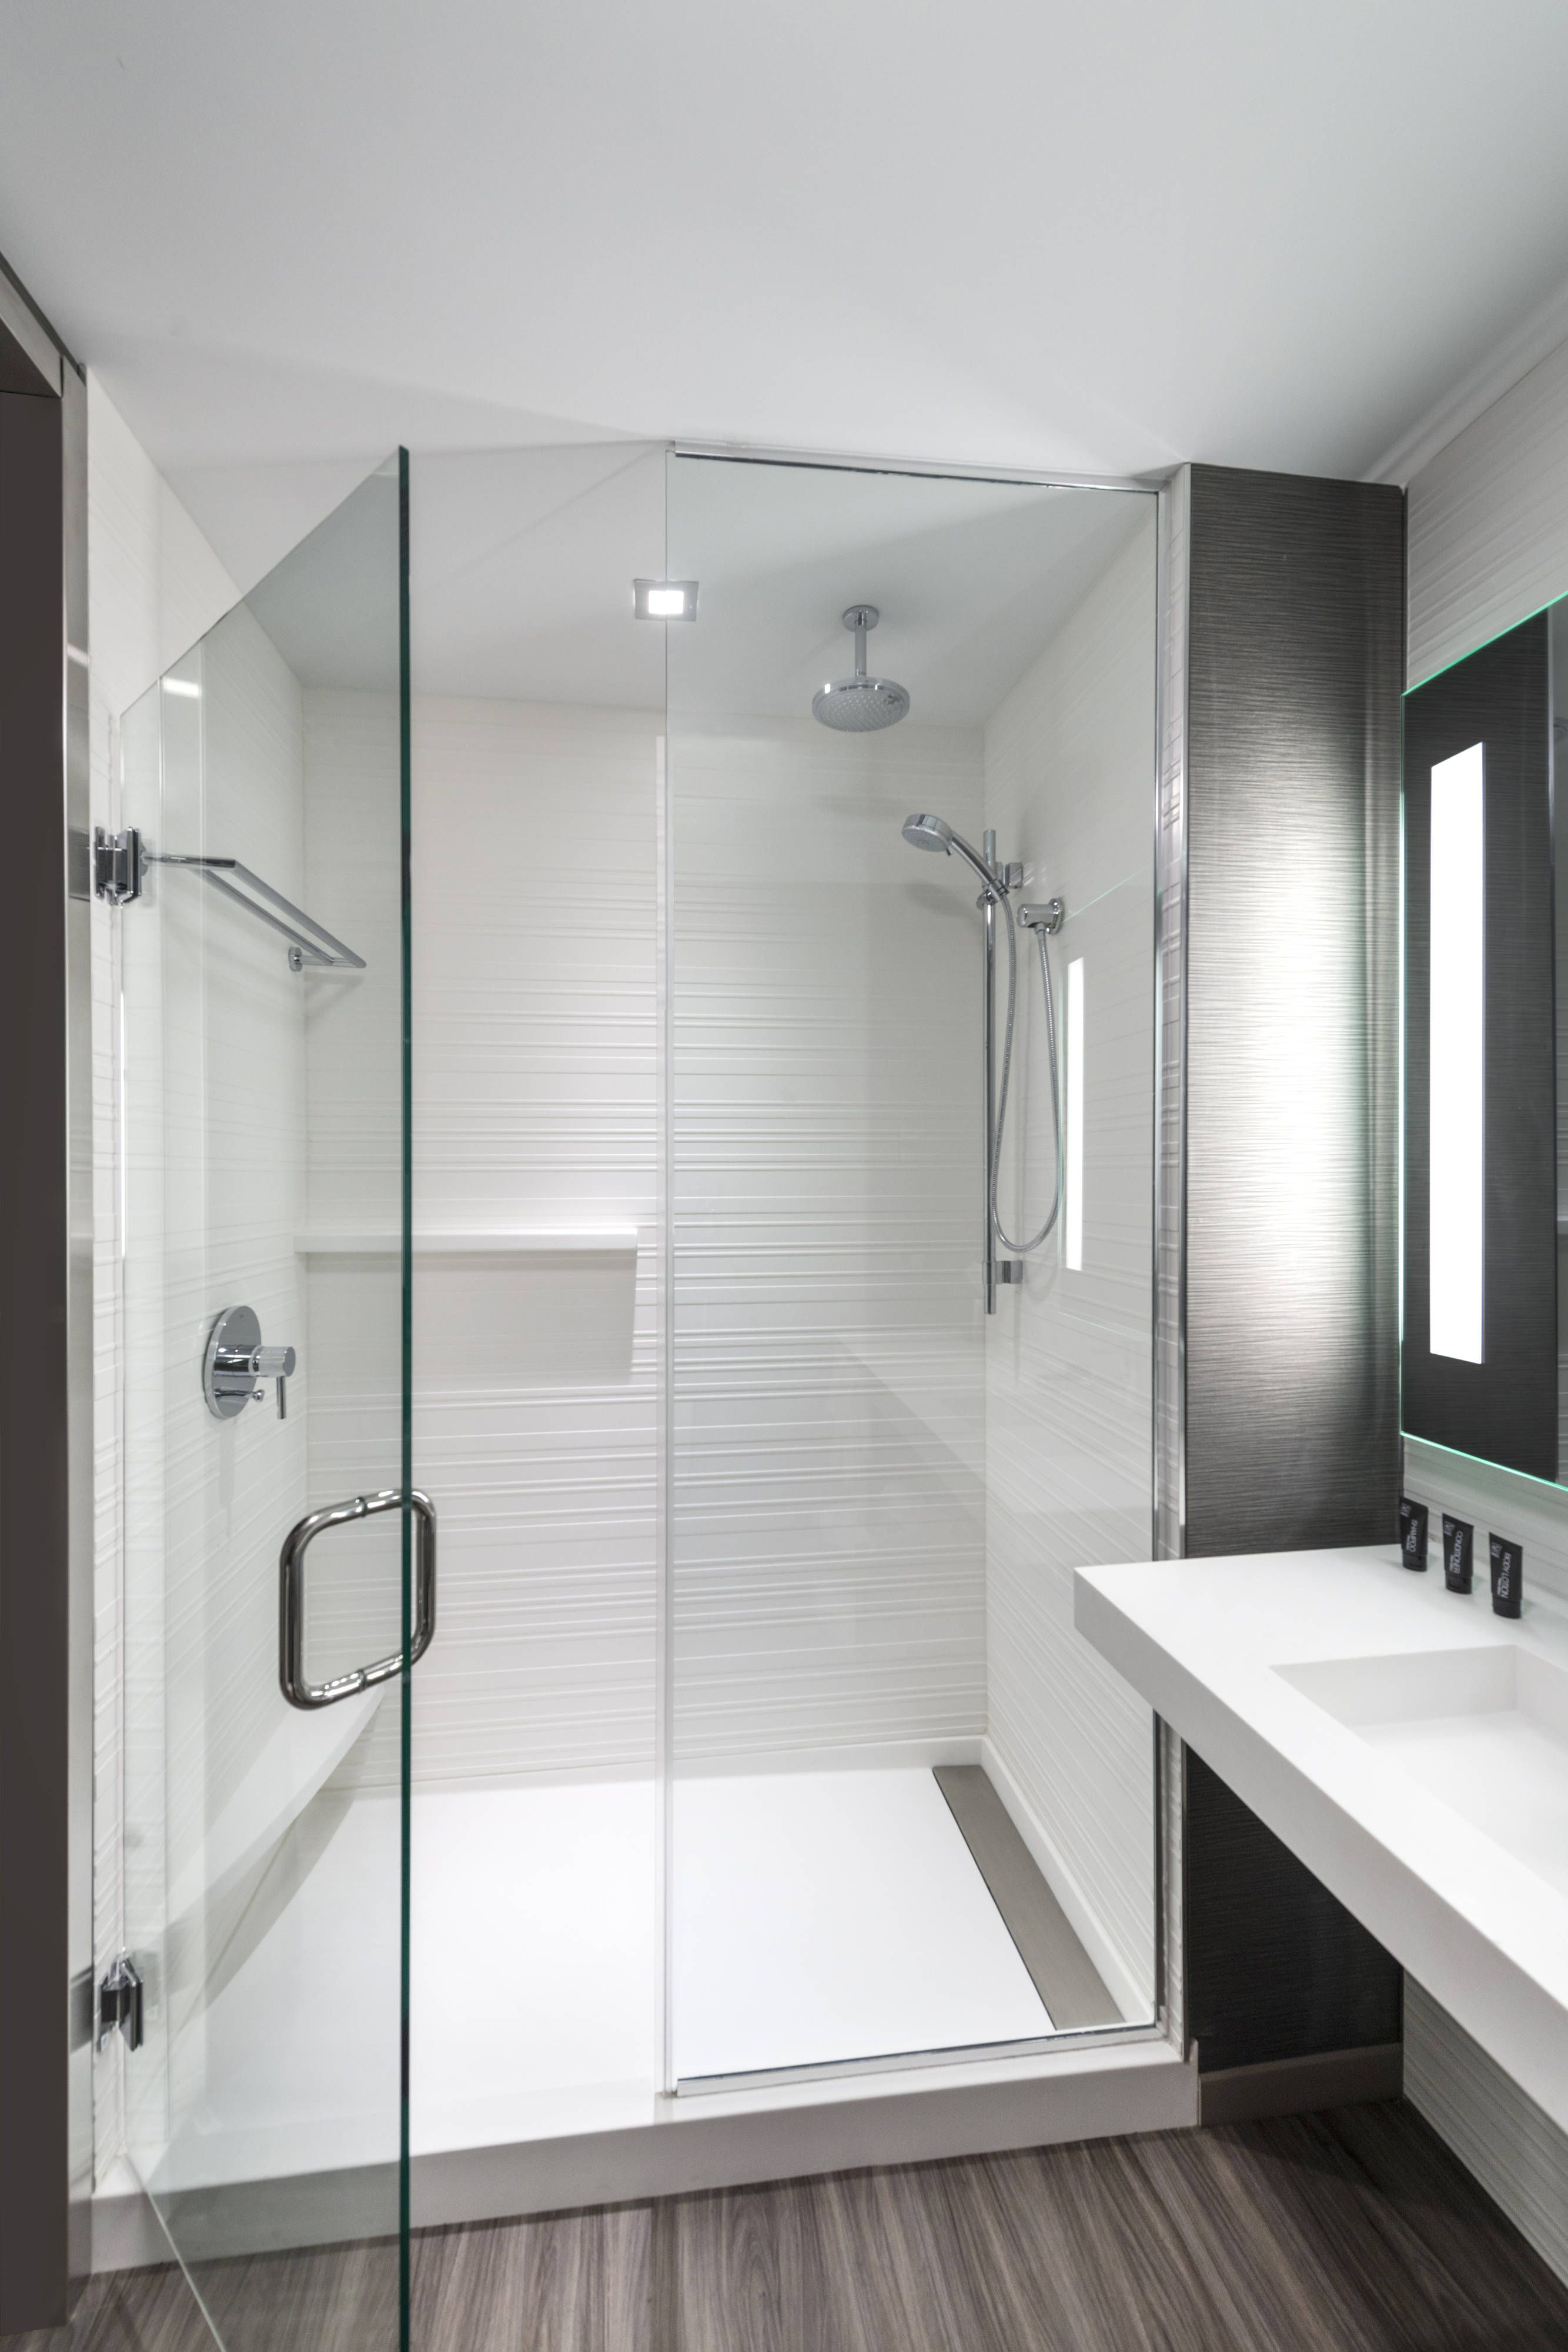 Ac Hotel Boston North Suite Bathroom Shower Guestroom Holiday Hotels Boston Hotels Ac Hotel Hotel